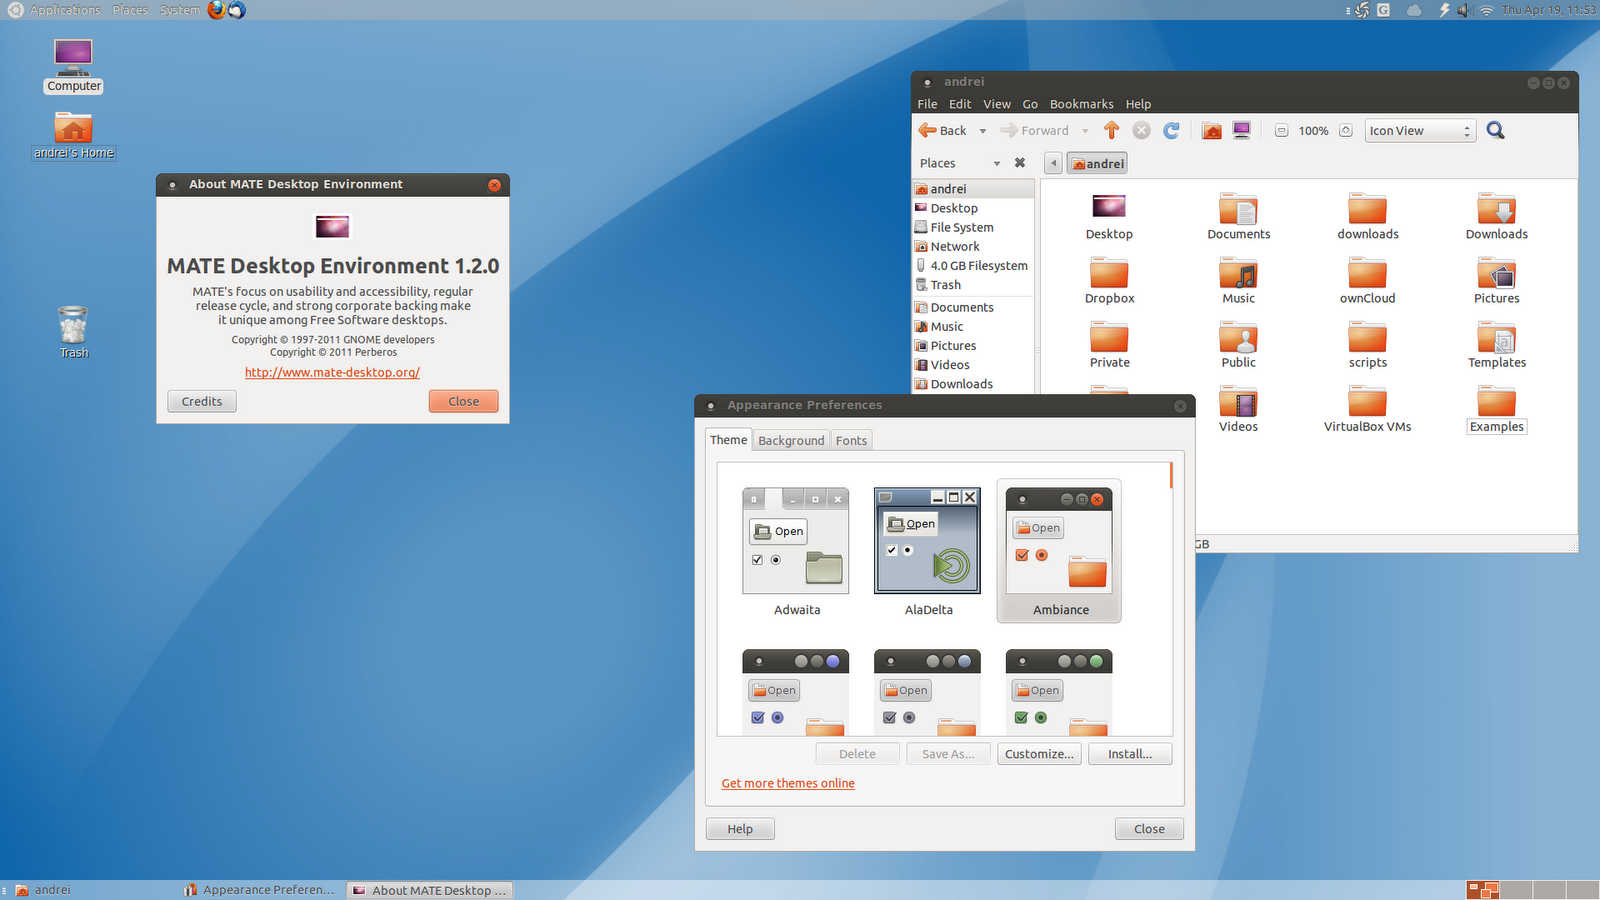 Portuxhuevos entornos de escritorio ubuntu - Environnement bureau linux ...